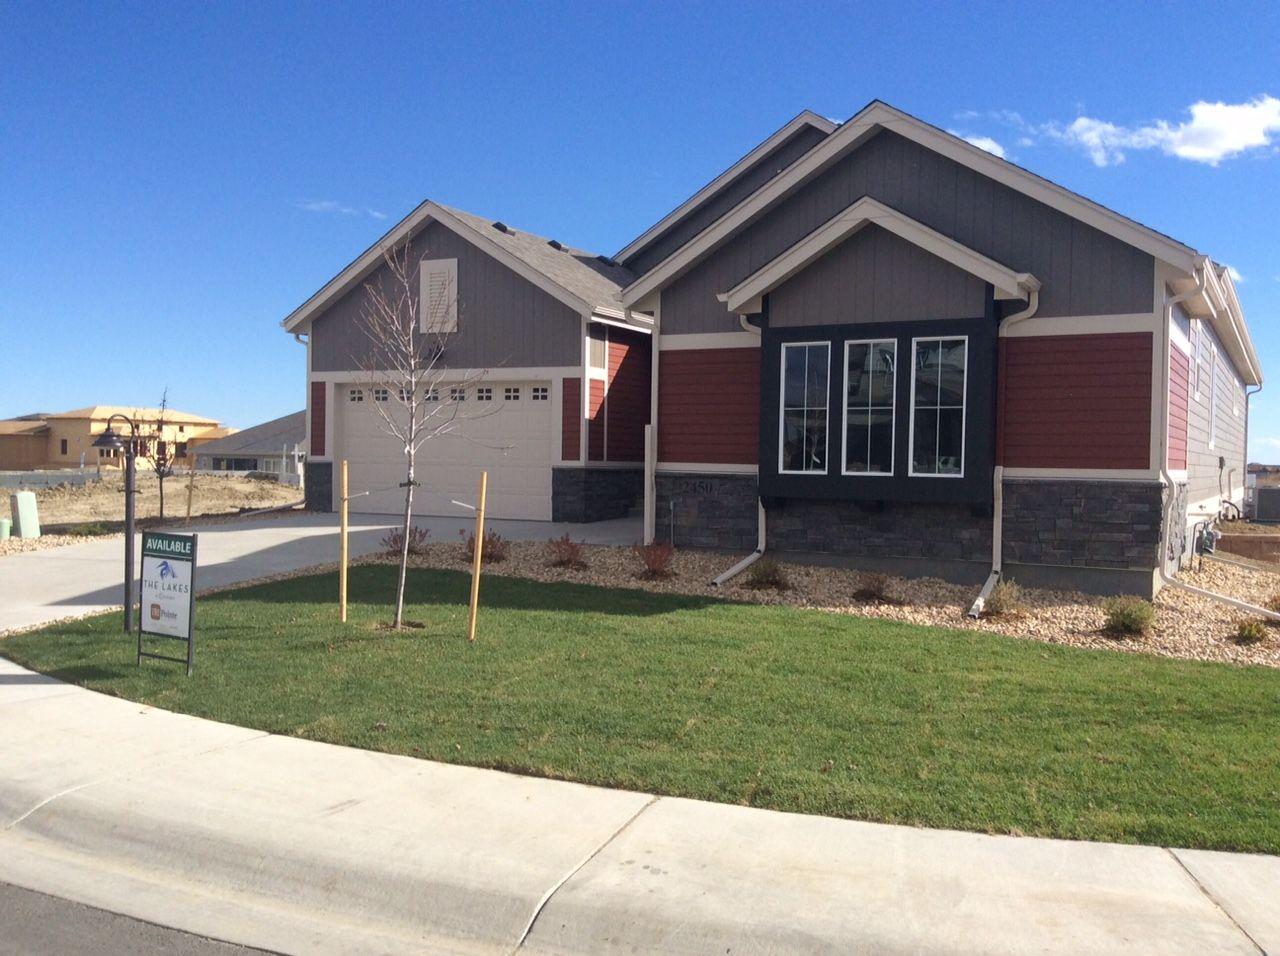 New Home Developments Loveland Colorado